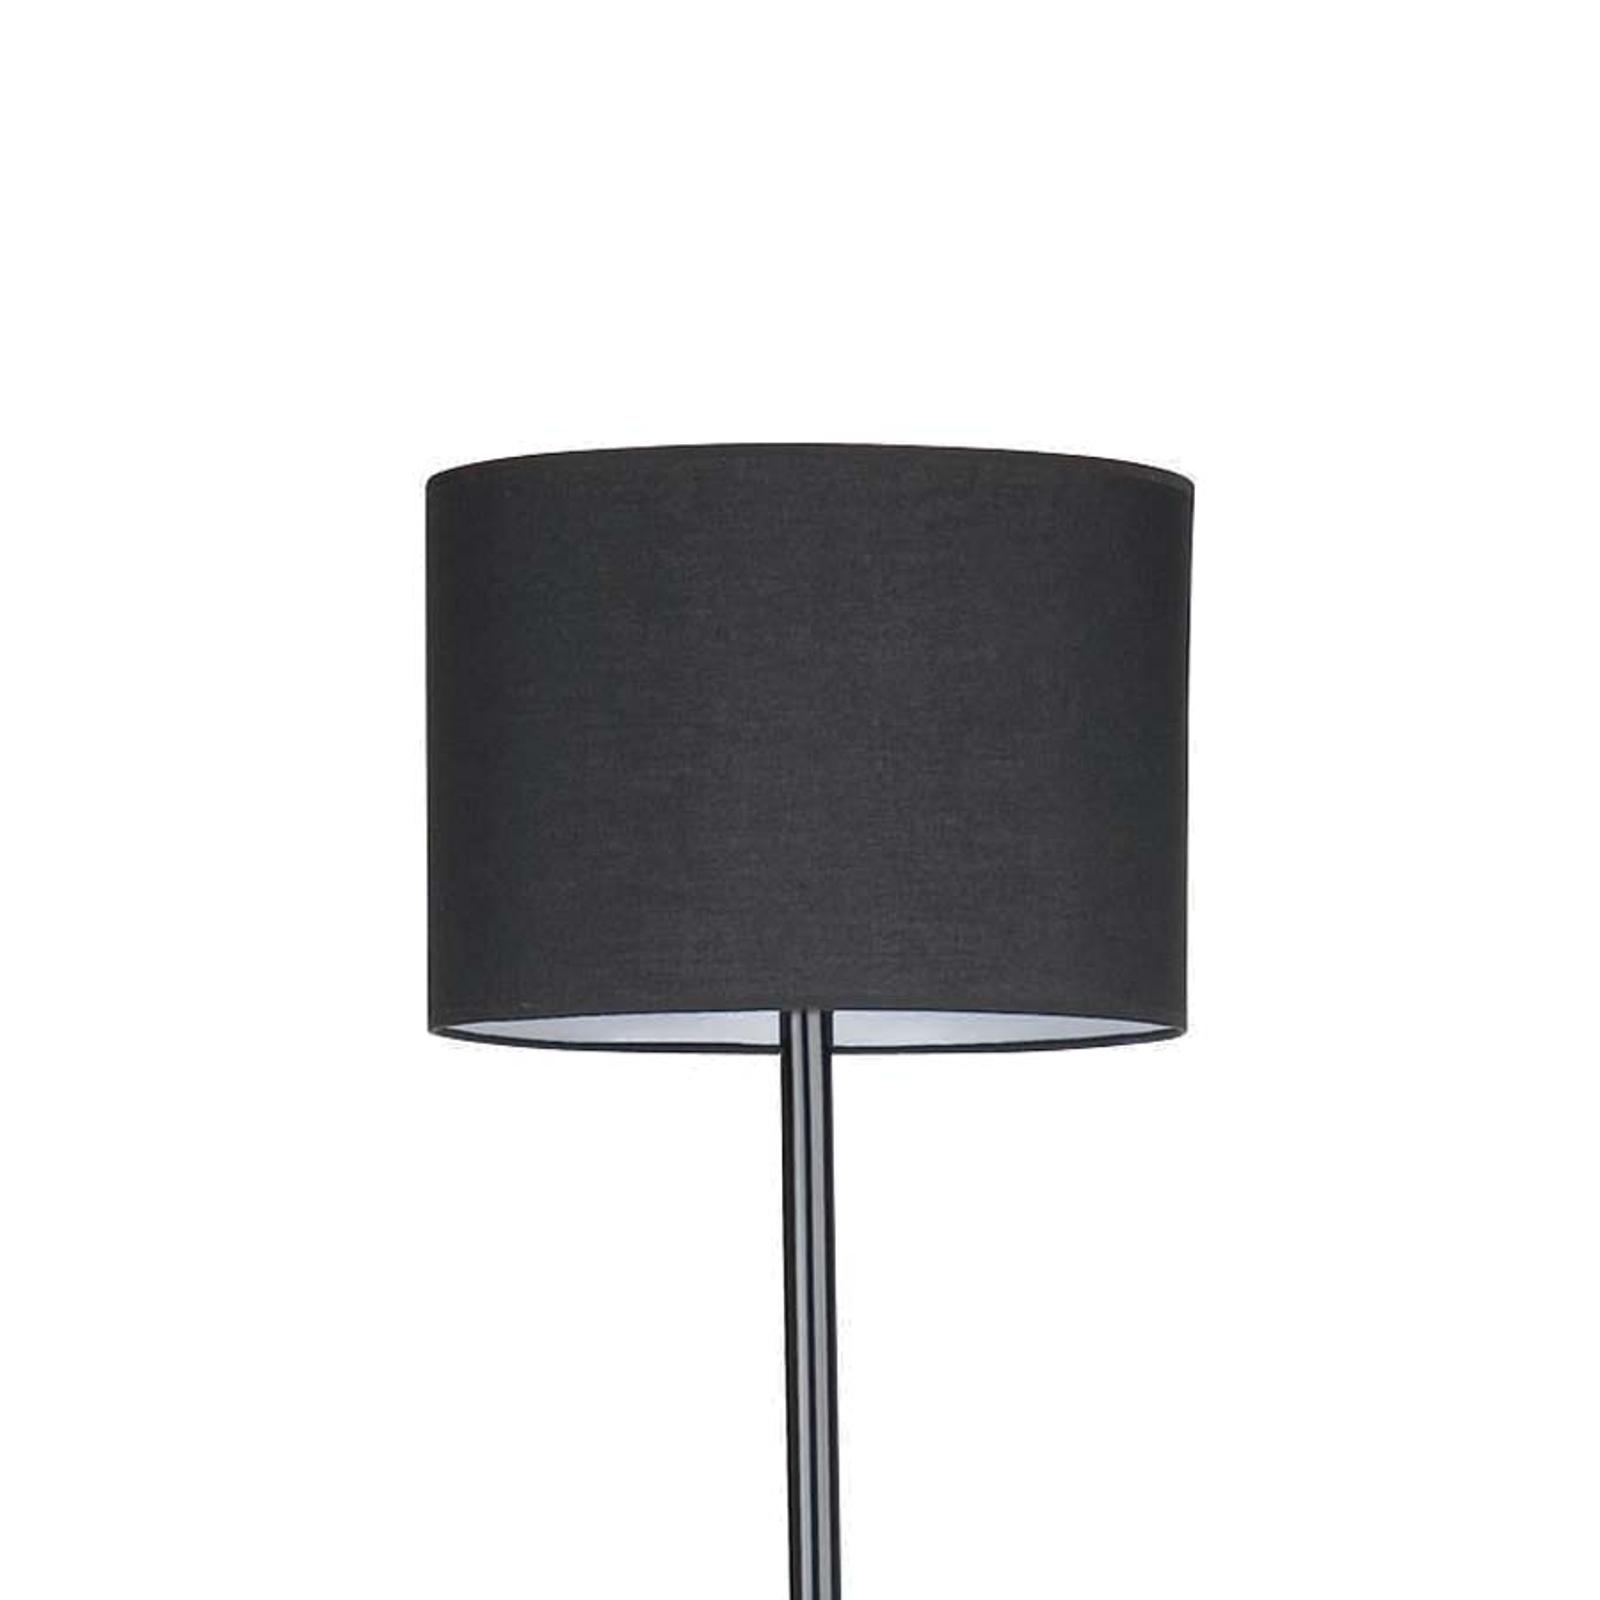 Black Imposing Floor Lamp_3506392_1